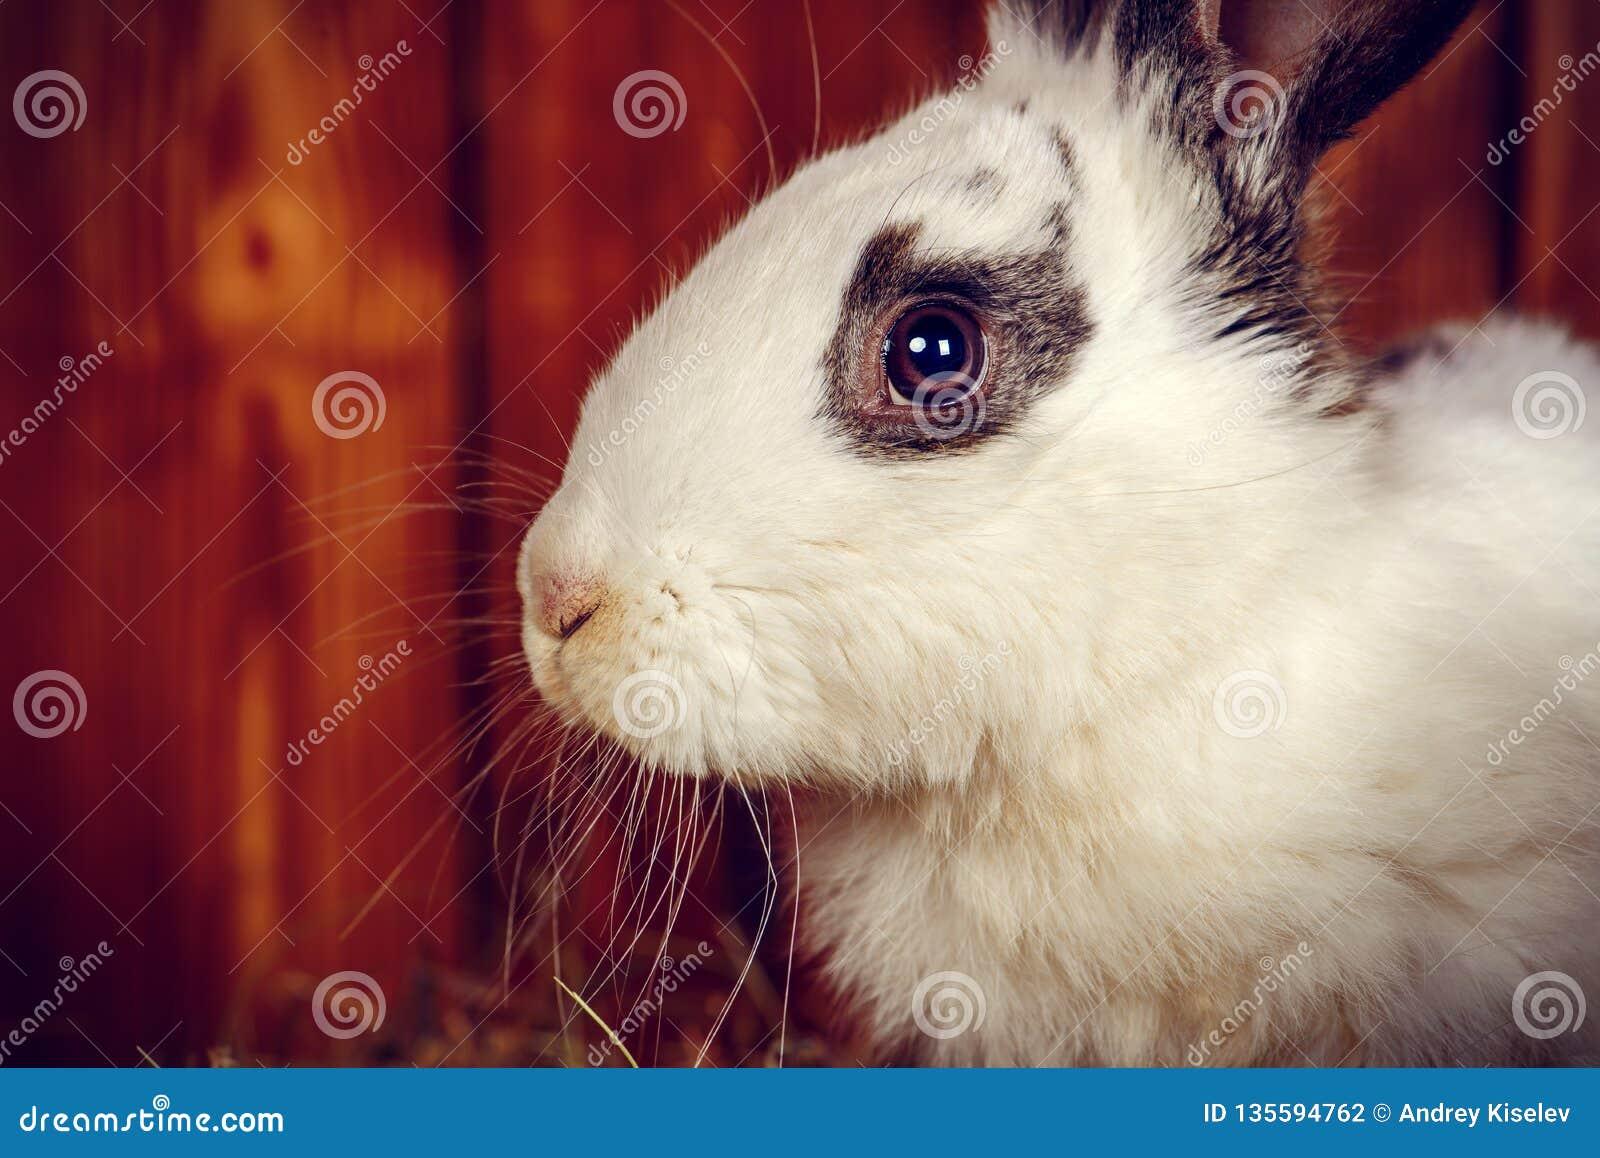 Fluffy easter bunny